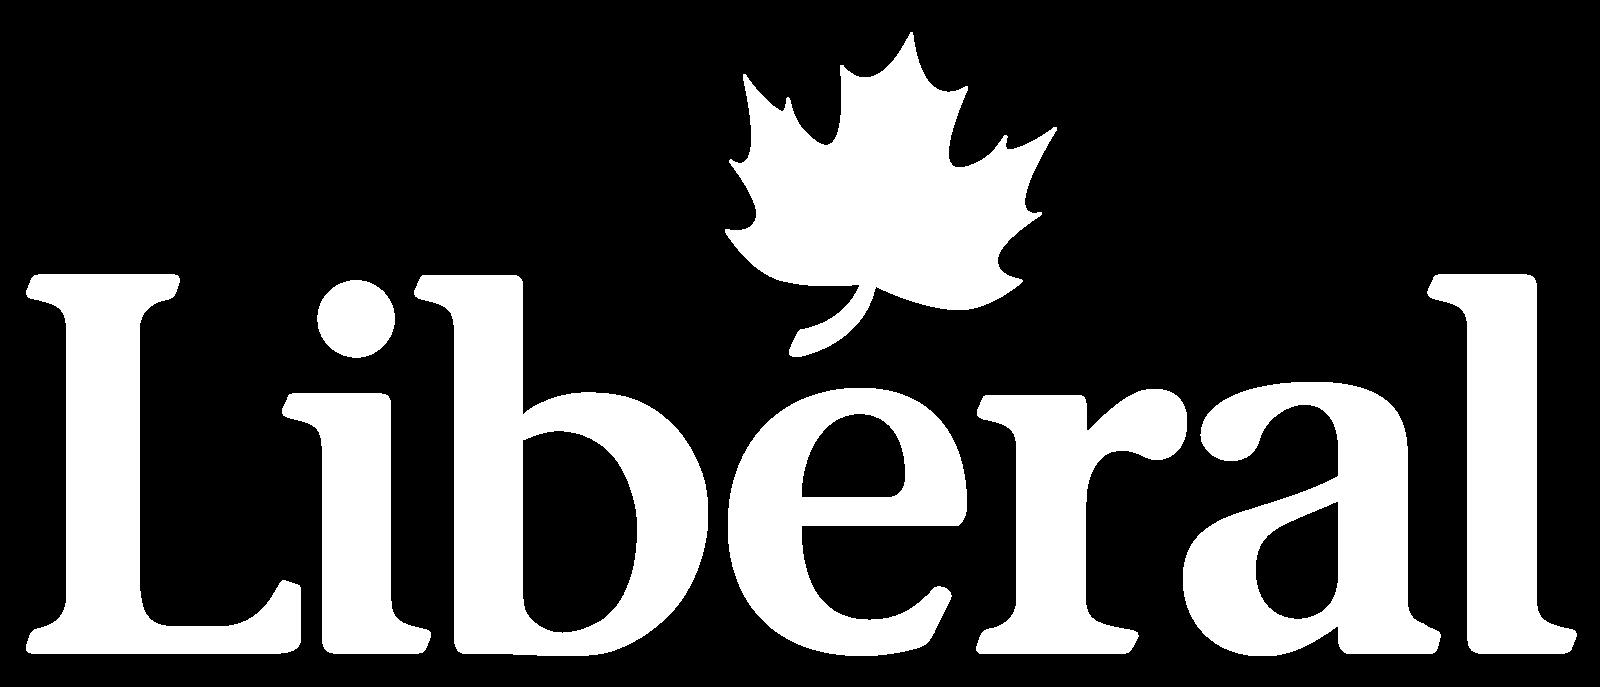 Logos & Graphics.